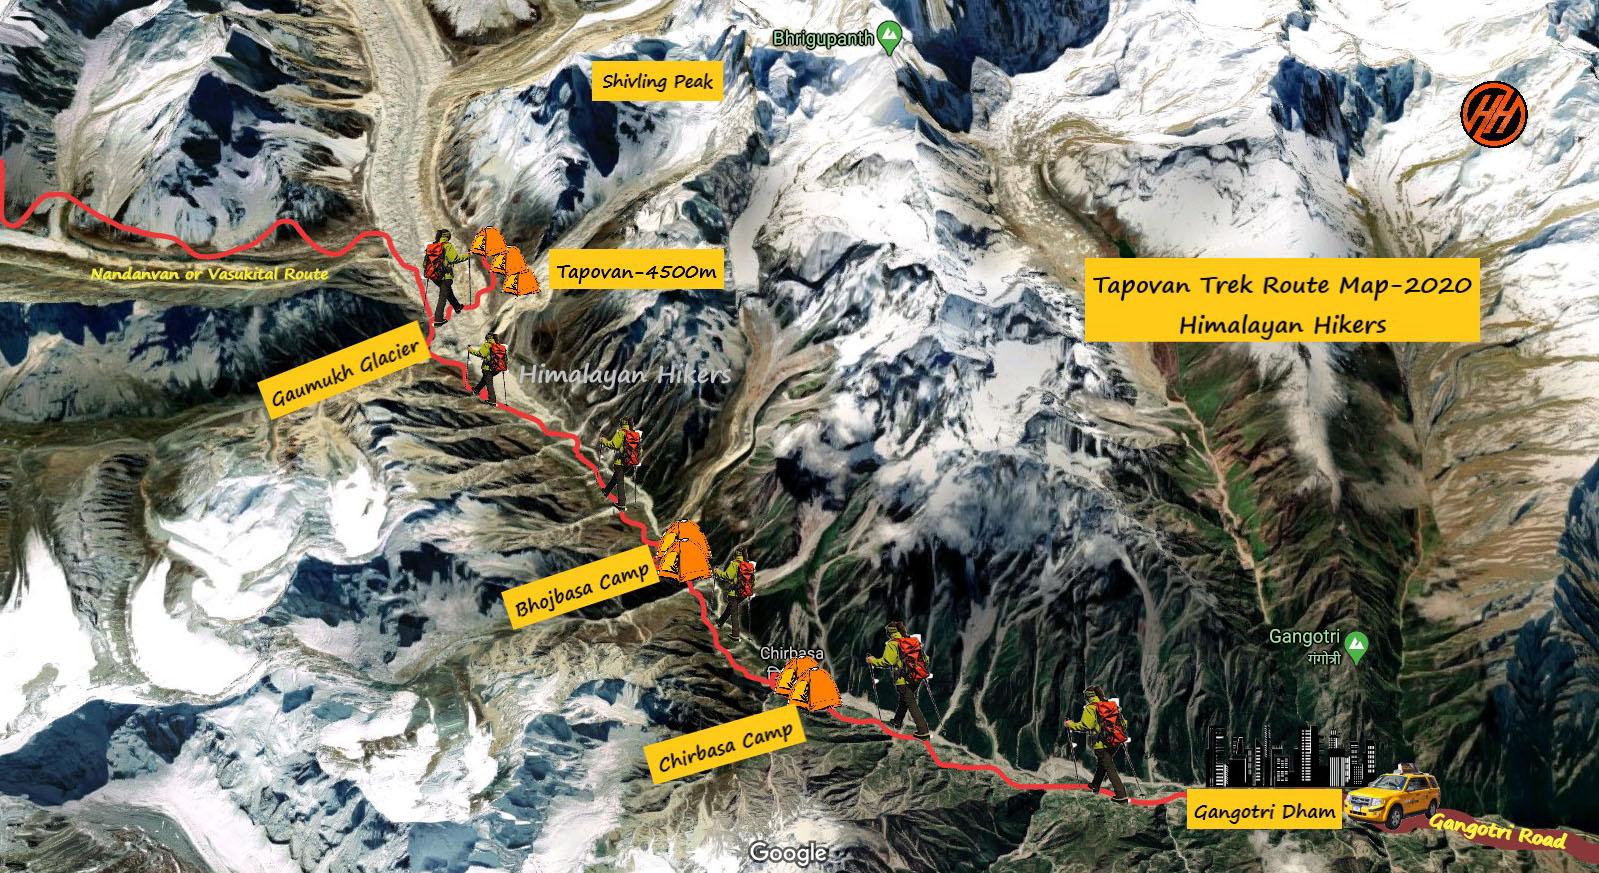 Tapovan Trek Route Map